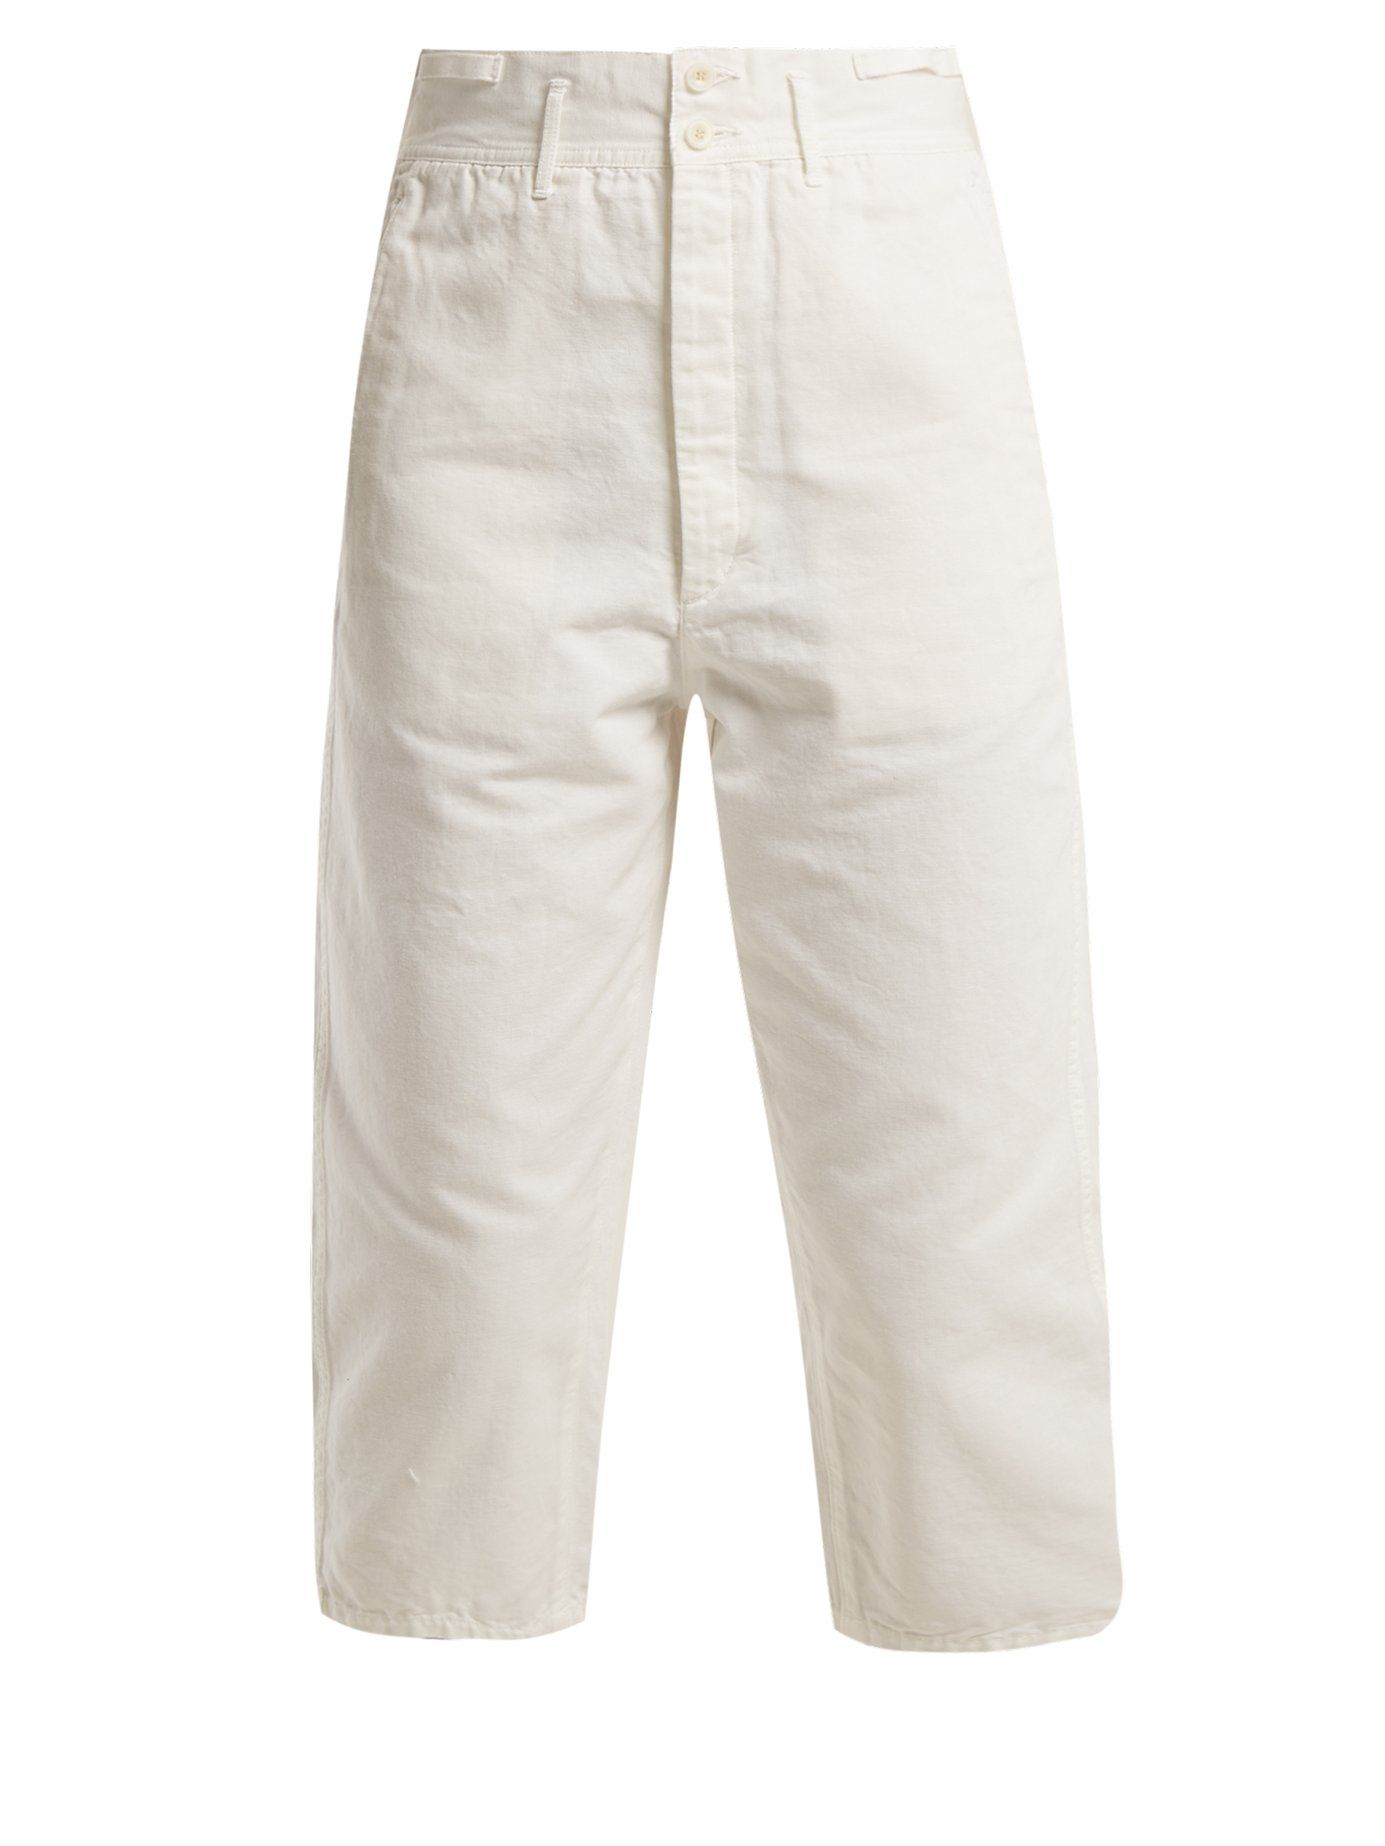 Chimala recortados de algodón Pantalones Farmer's Work de HwZ0xq